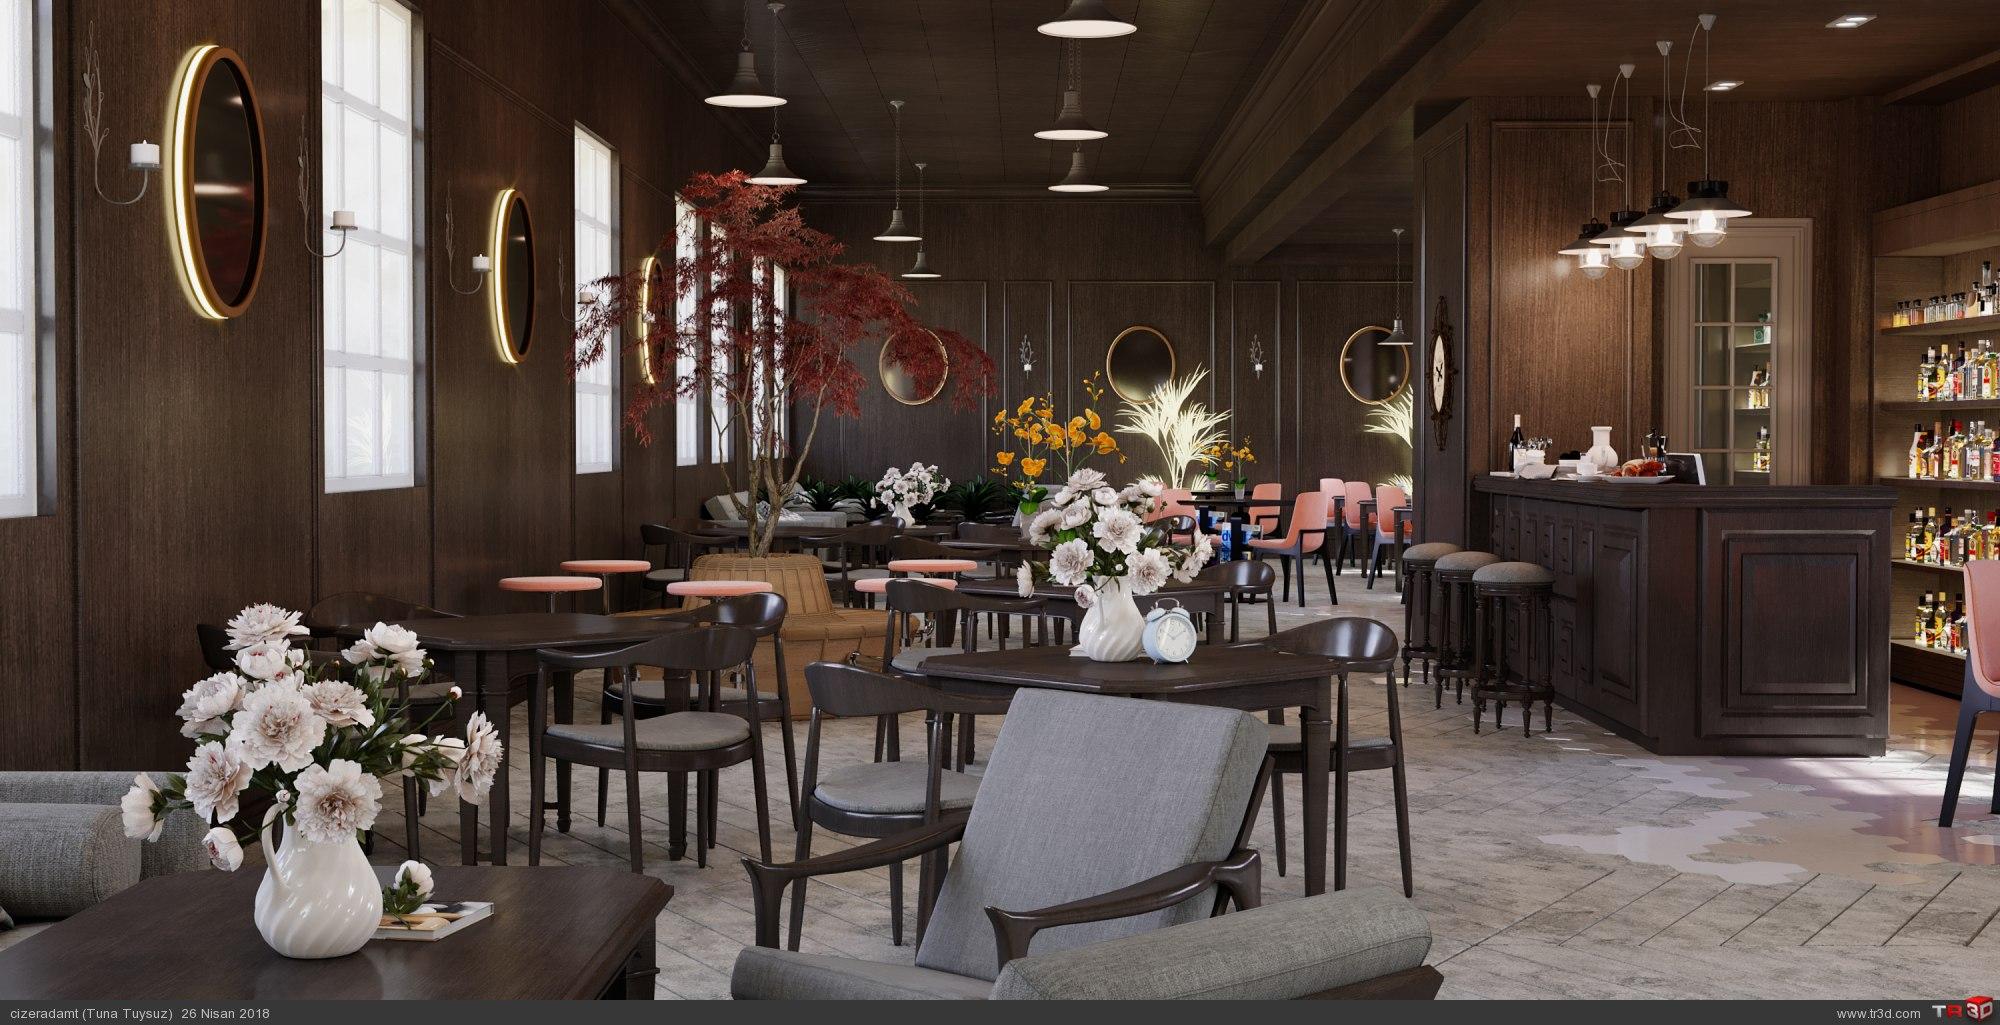 Anadolu Roma Enstitüsü Cafe Tasarımı 1